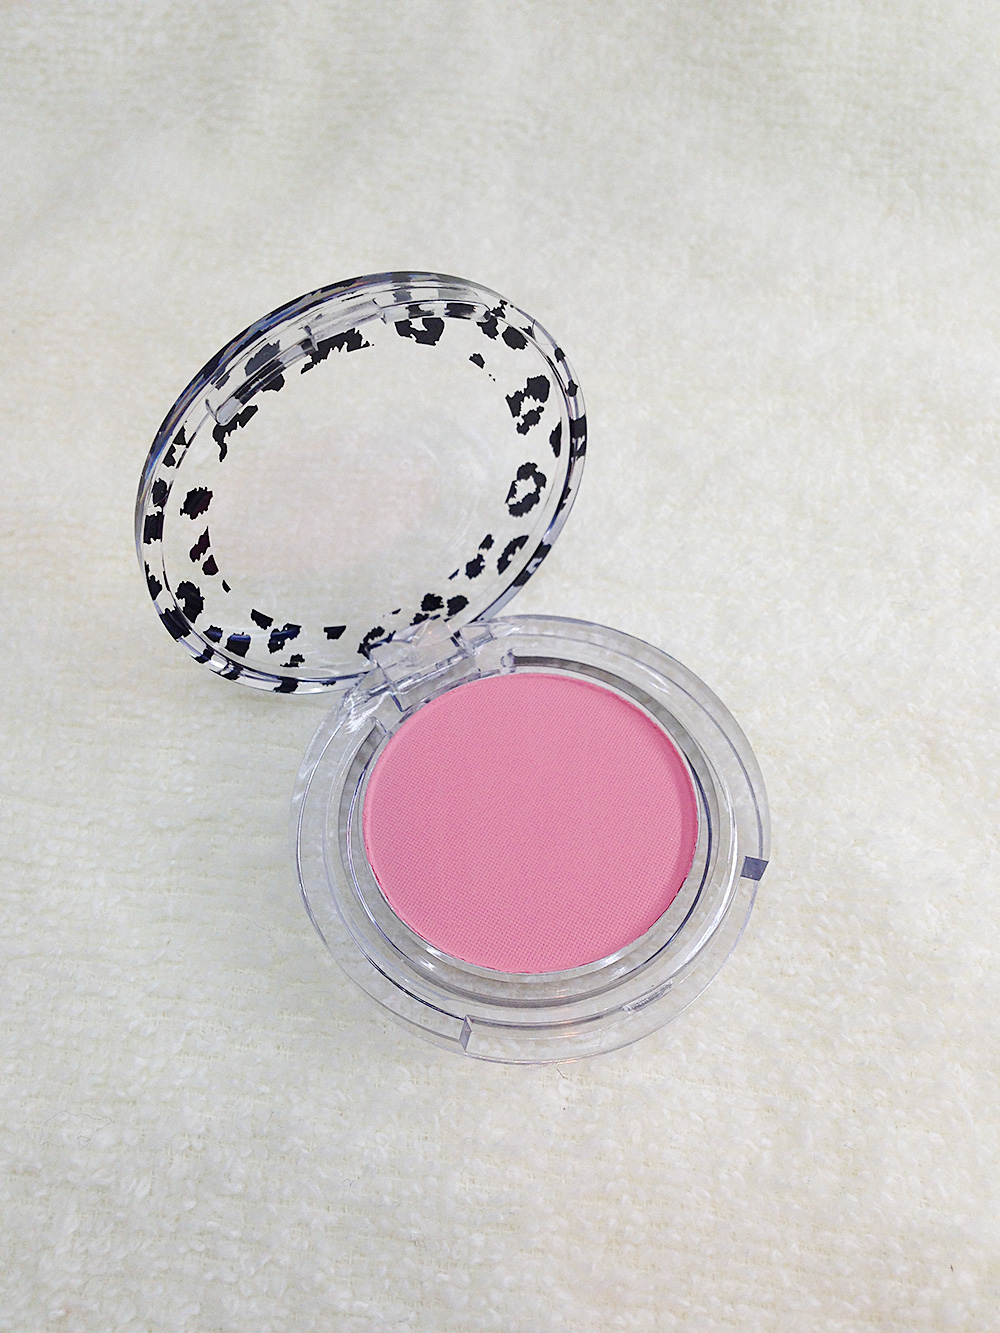 MPアニマルチーク2(ピンク)の写真つきレビュー